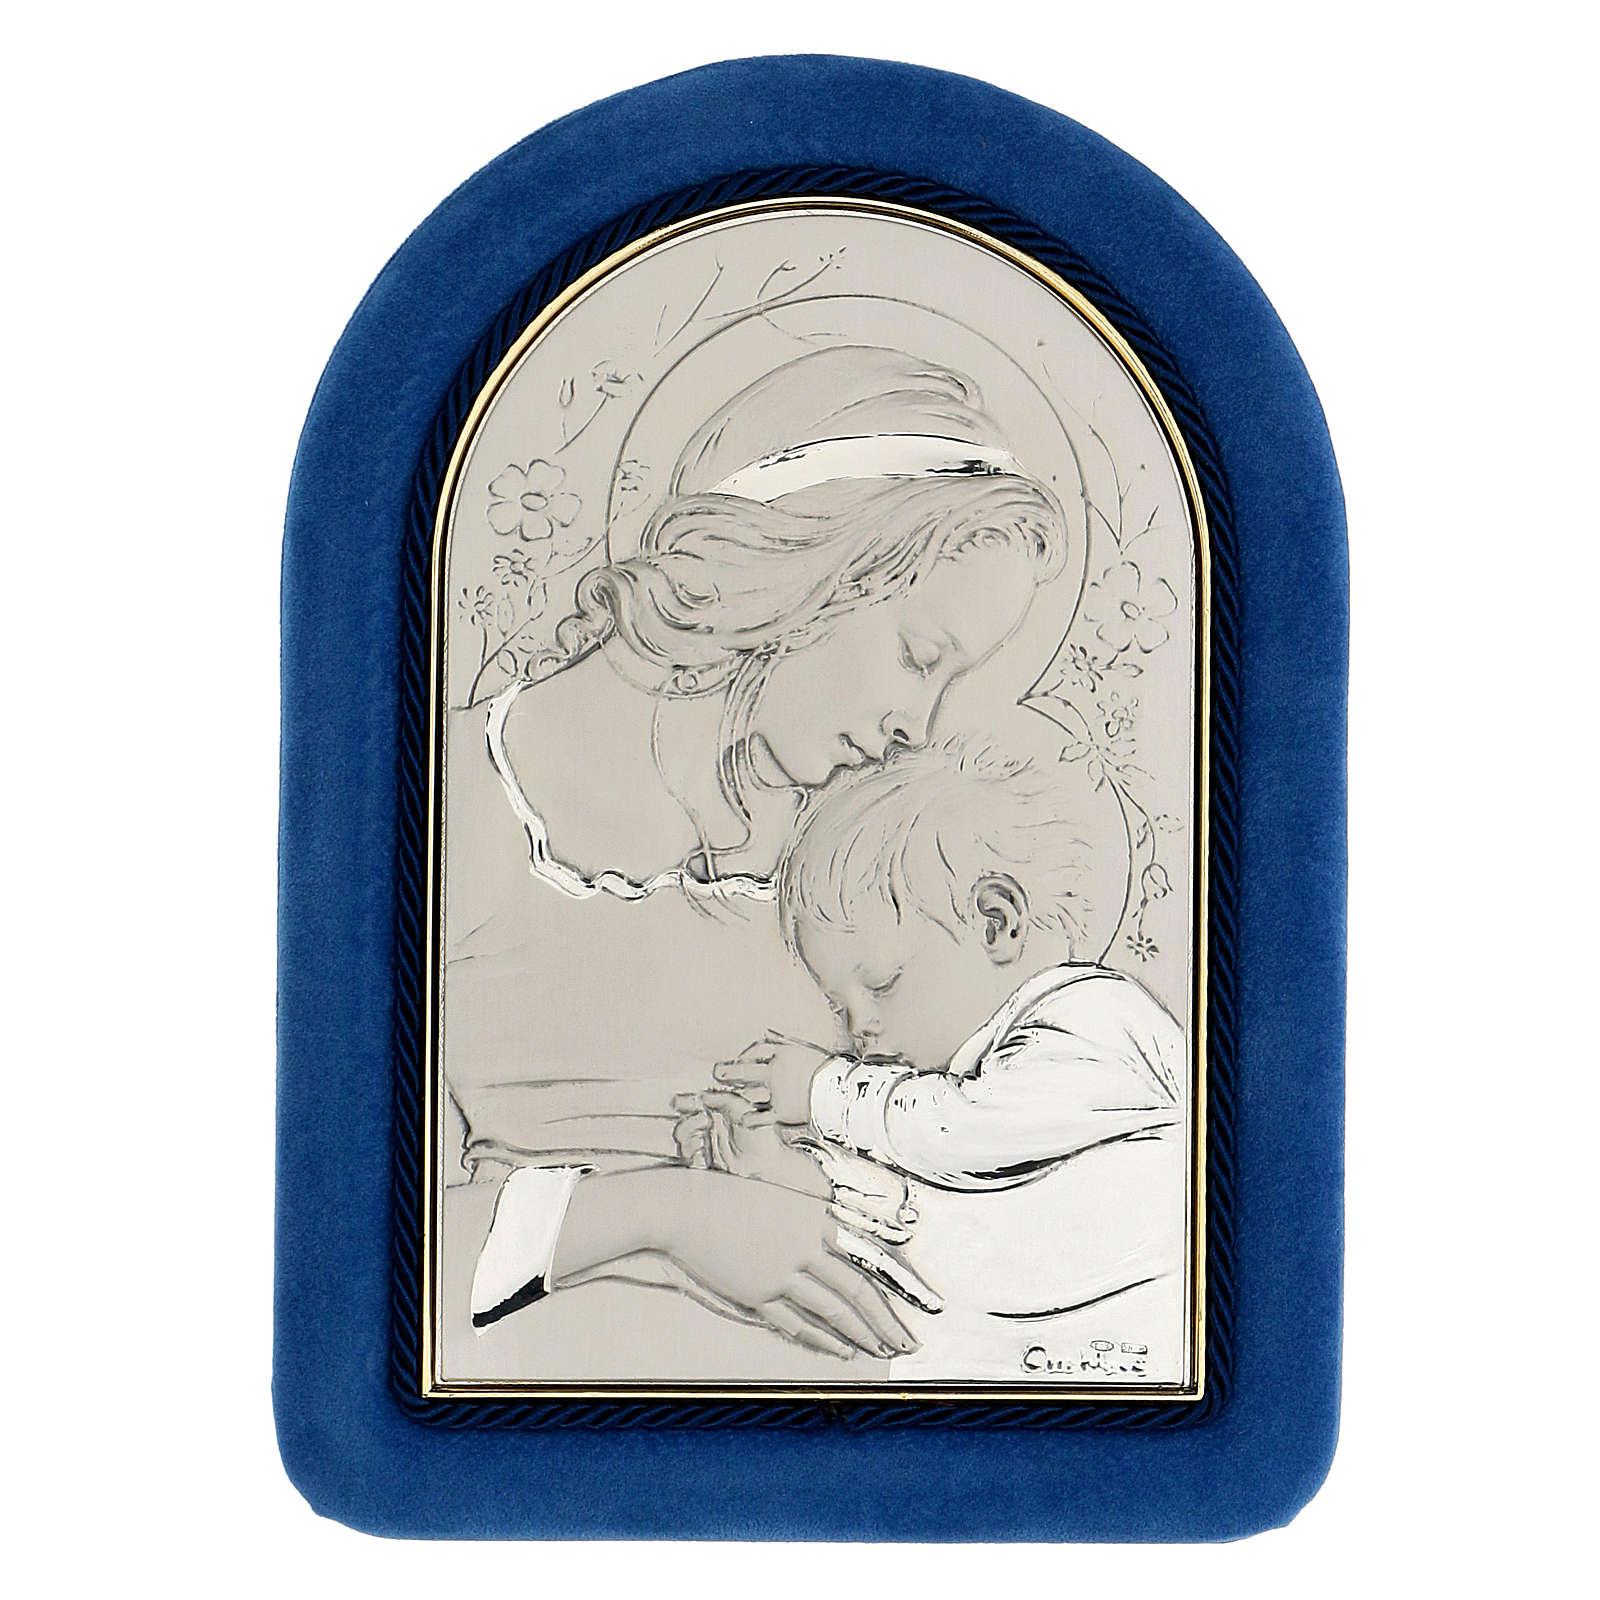 Bas-relief, Virgin Mary and baby Jesus sleeping, velvet frame 4